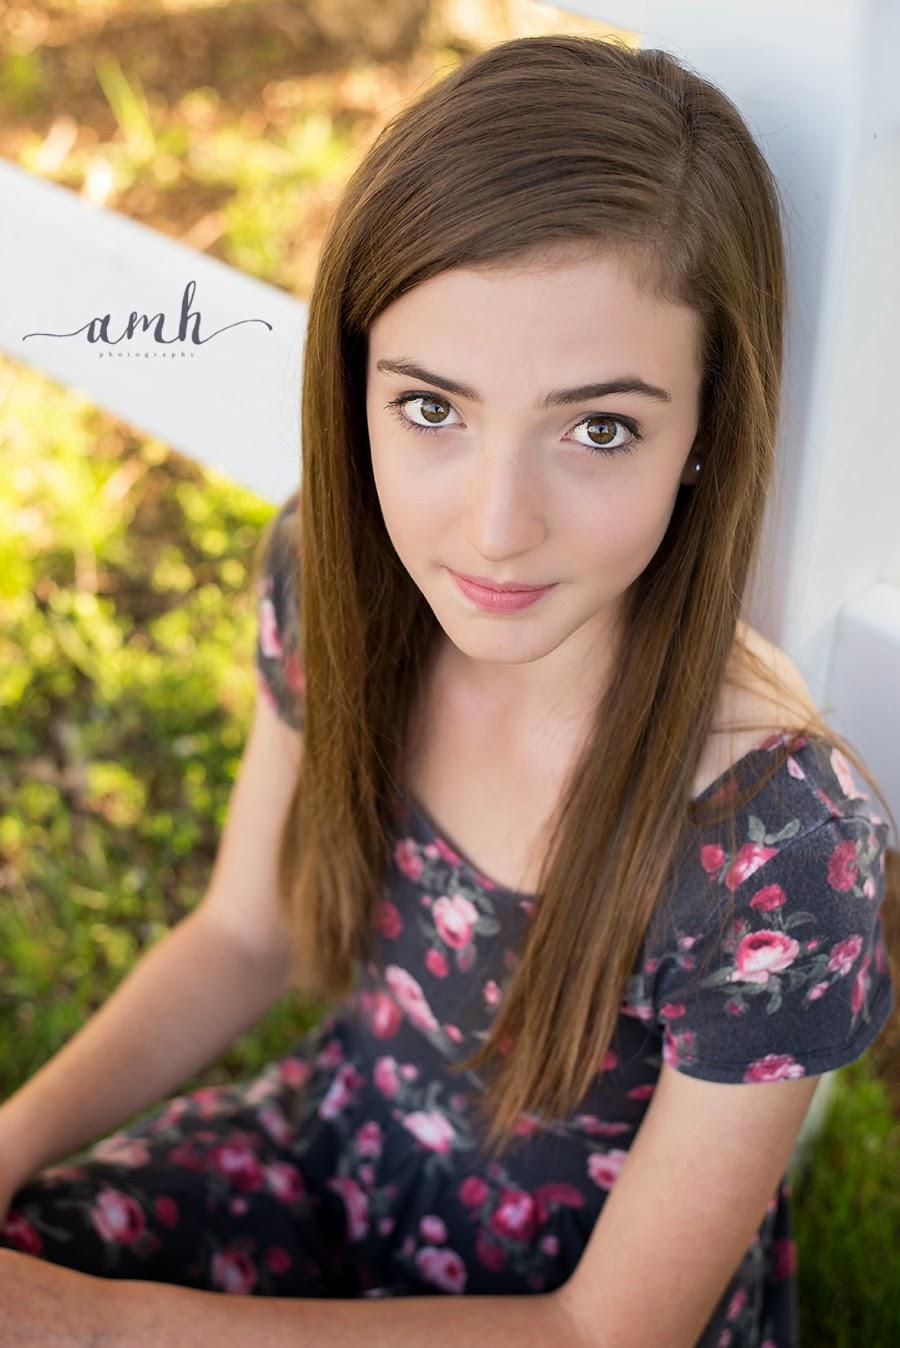 Winston-Salem Teen Photography